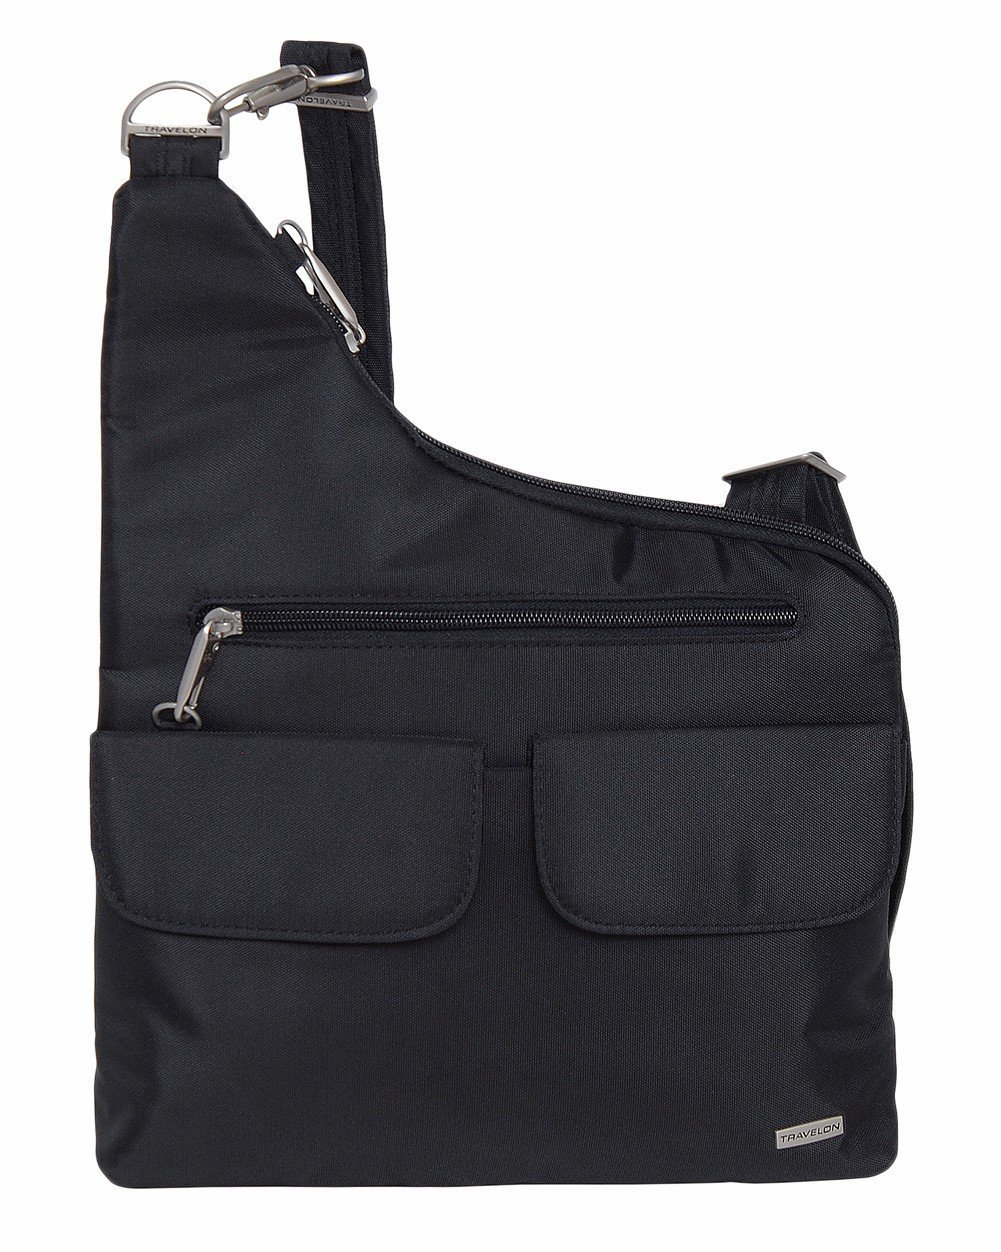 Travelon Anti-Theft Cross-Body Bag (Black W/Floral Lining)